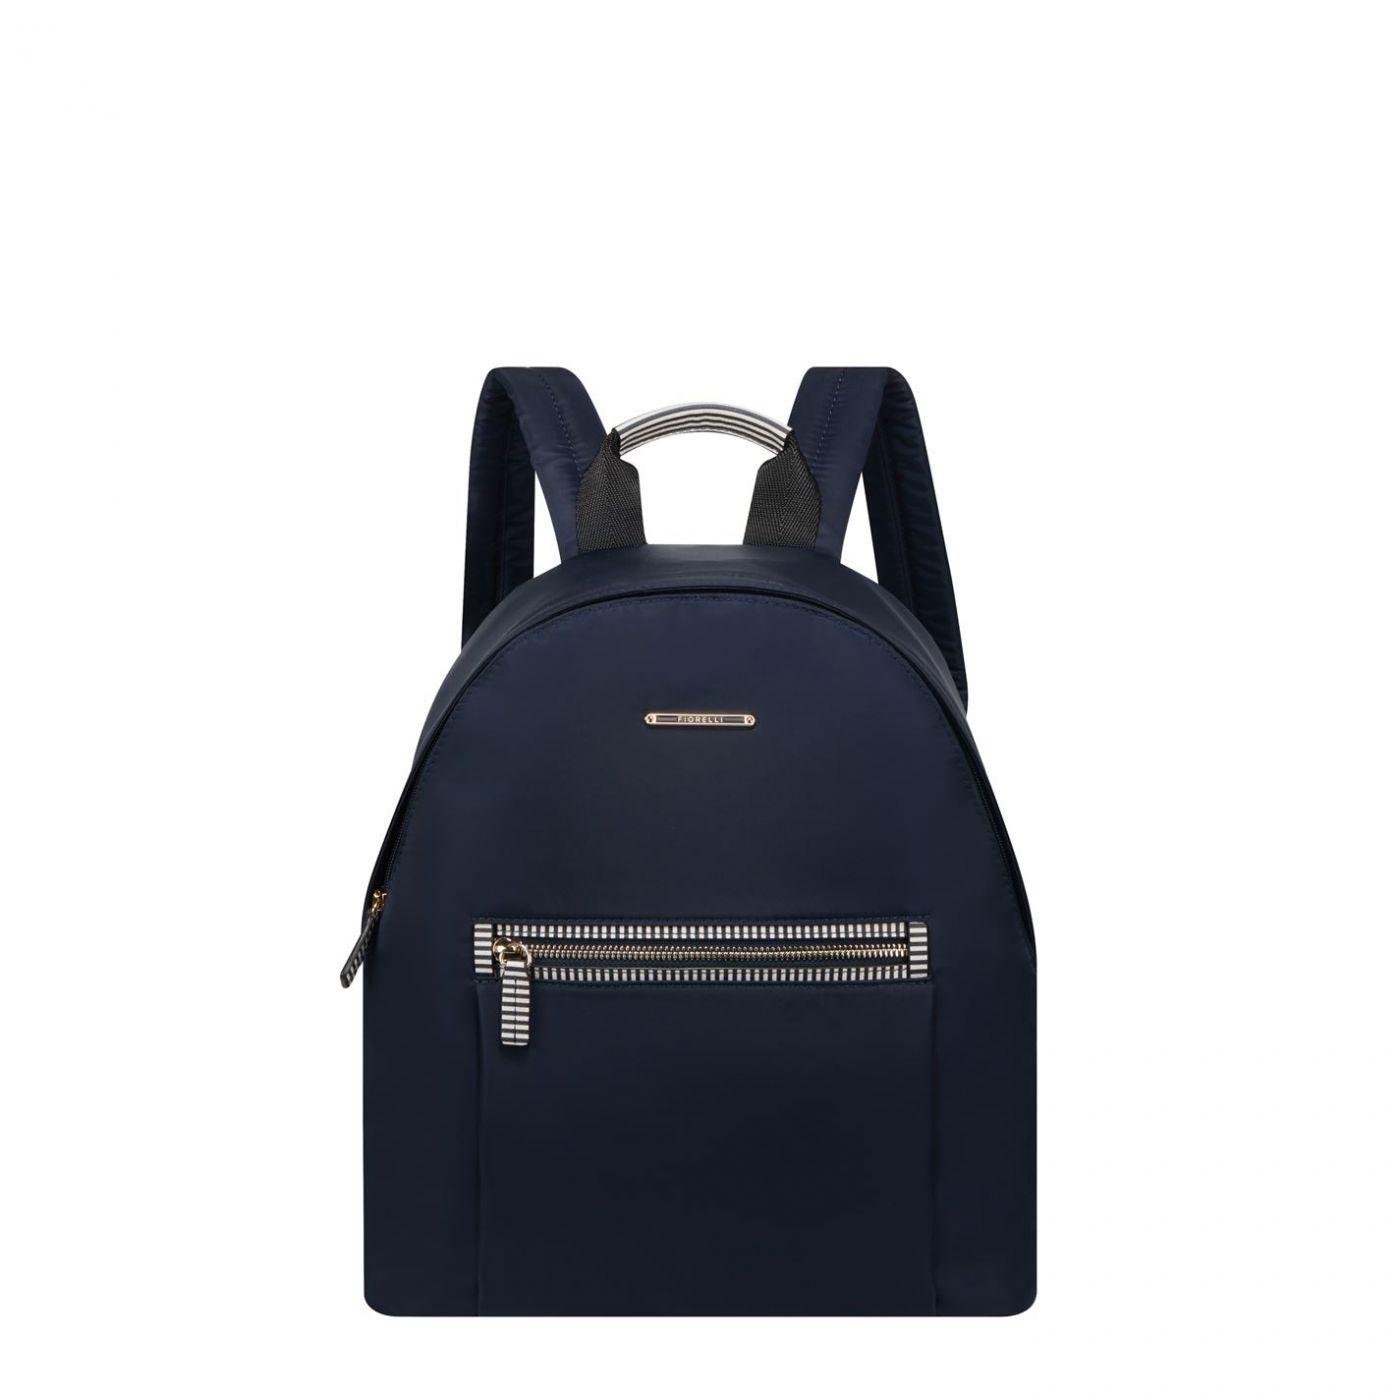 Fiorelli Sarah Nylon Backpack